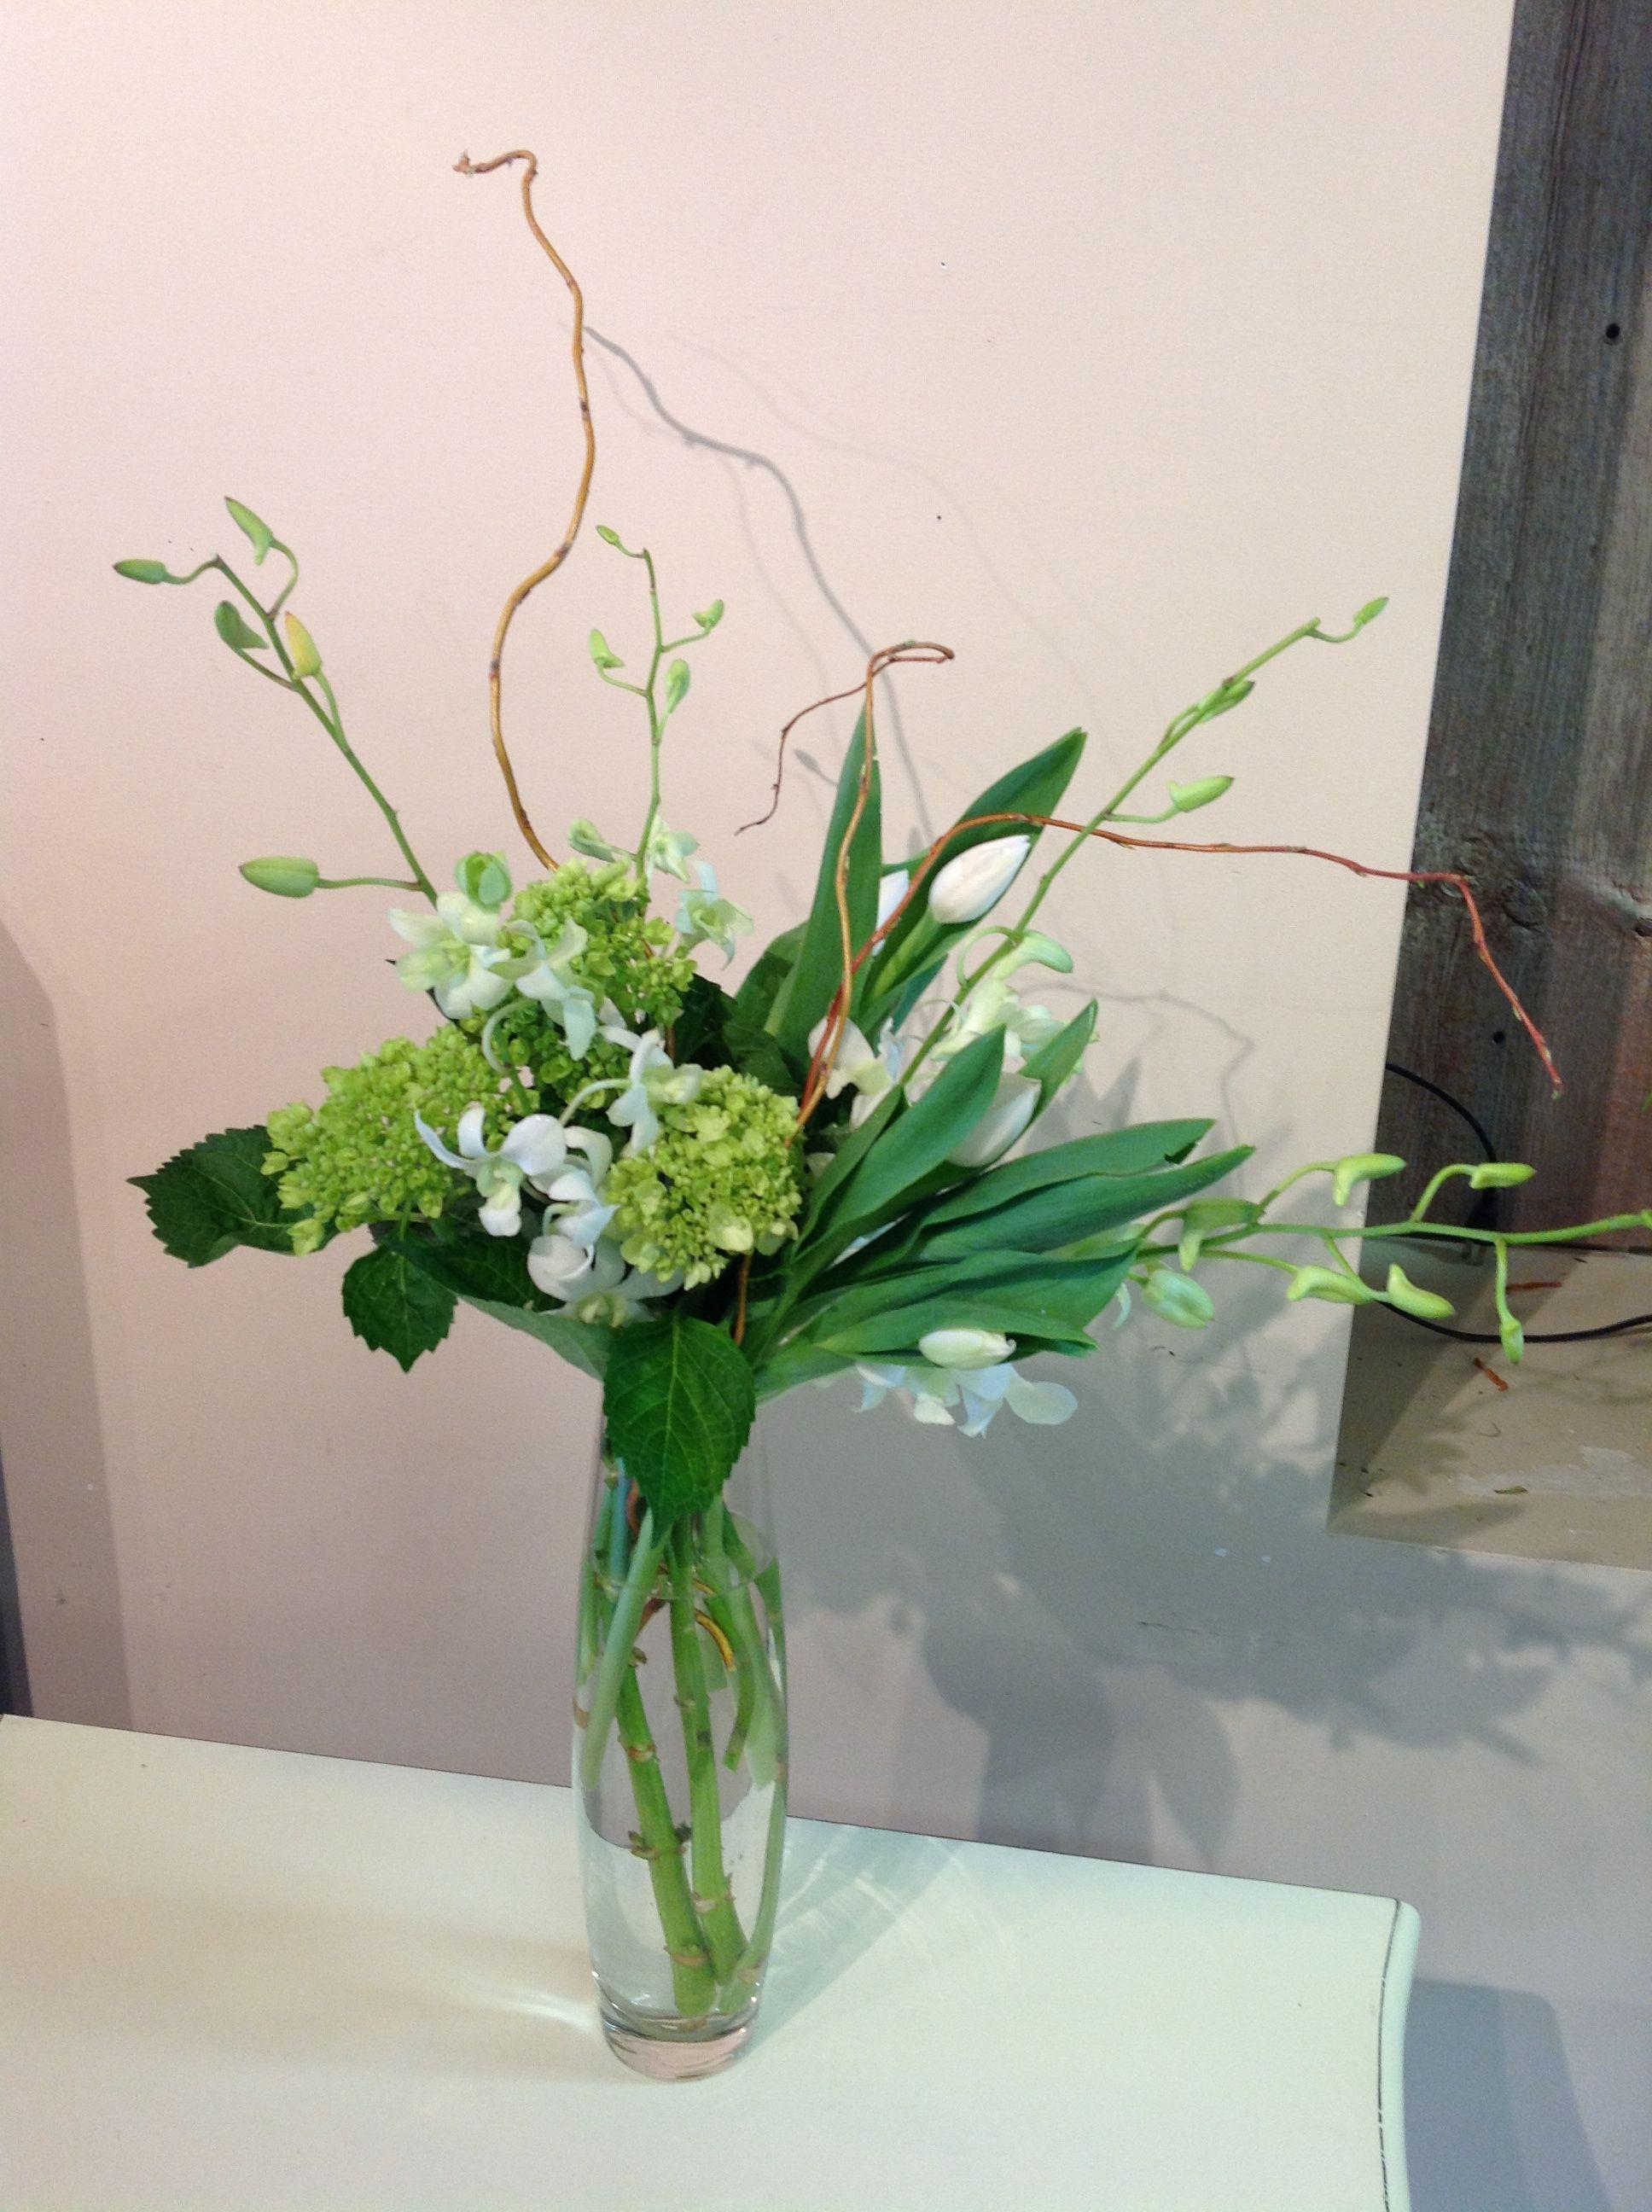 Creative Vase Arrangement With Curly Willow And Green Hydrangea Vase Arrangements Green Hydrangea Vase